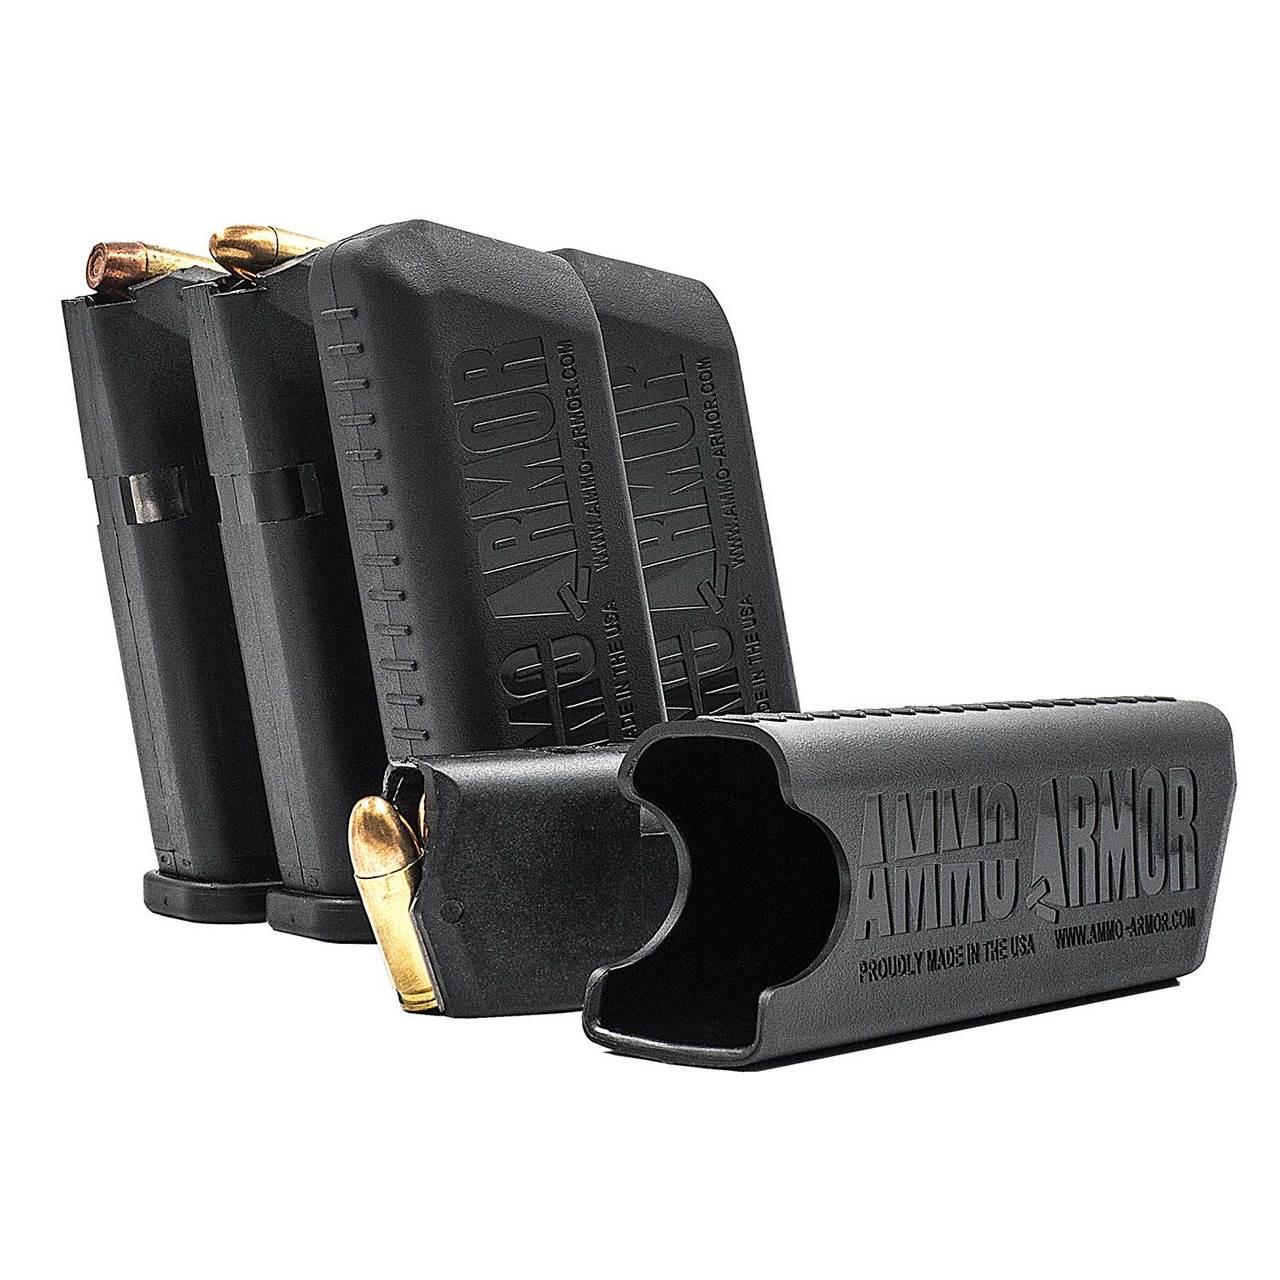 Smith & Wesson M&P 9 Ammo Armor